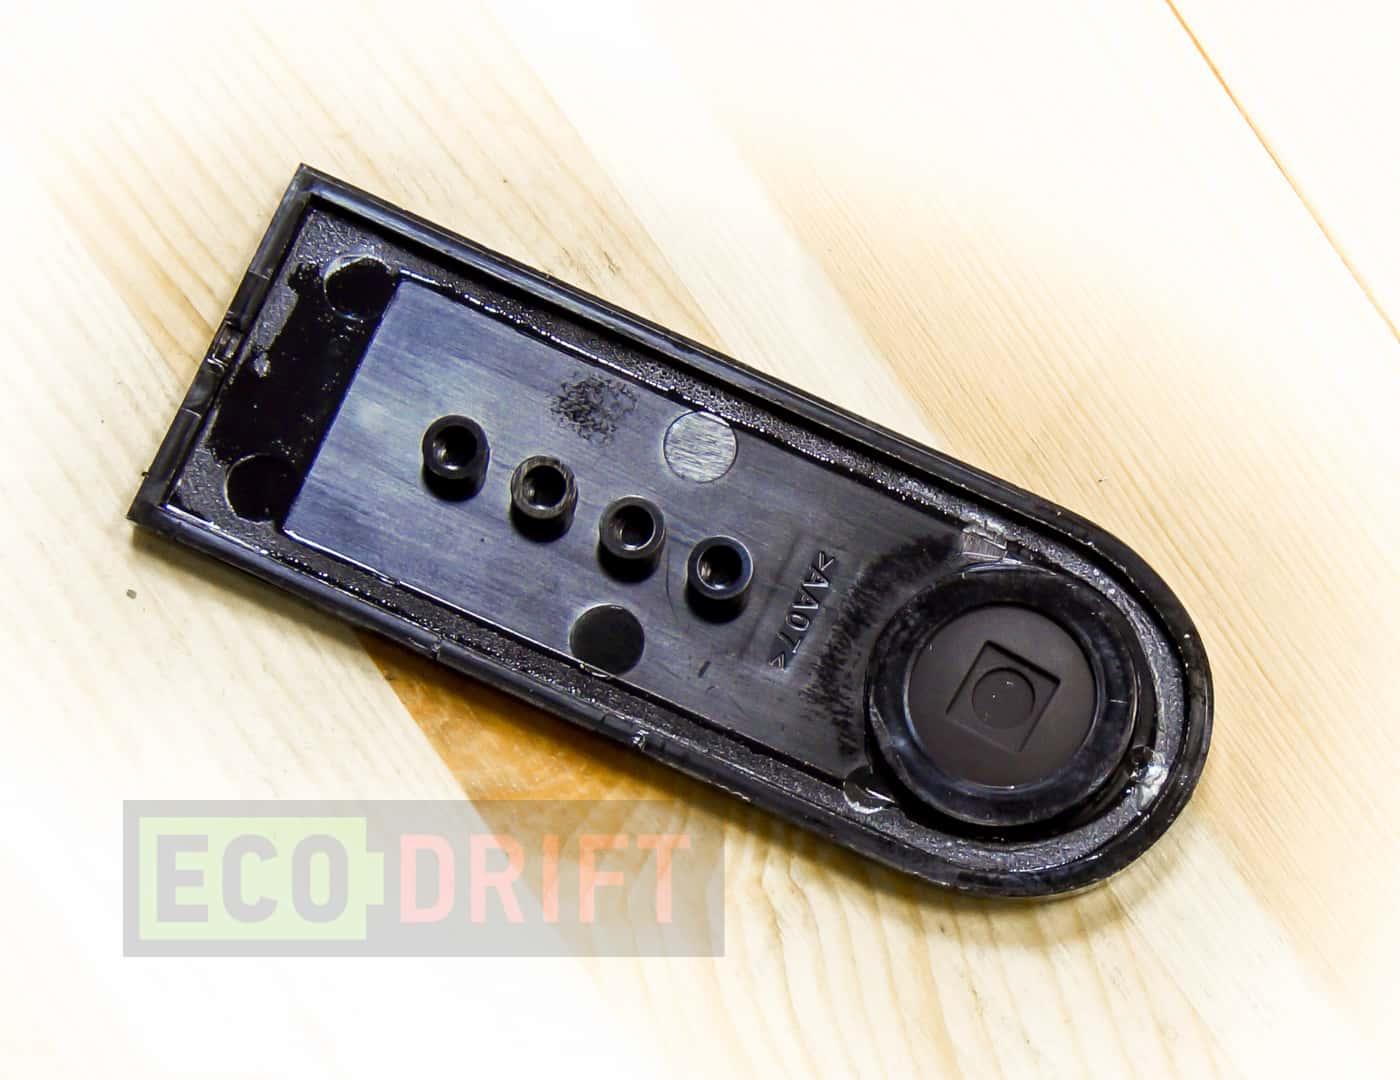 Xiaomi_Mijia_Electric_Scooter_герметичная_резиновая_кнопка